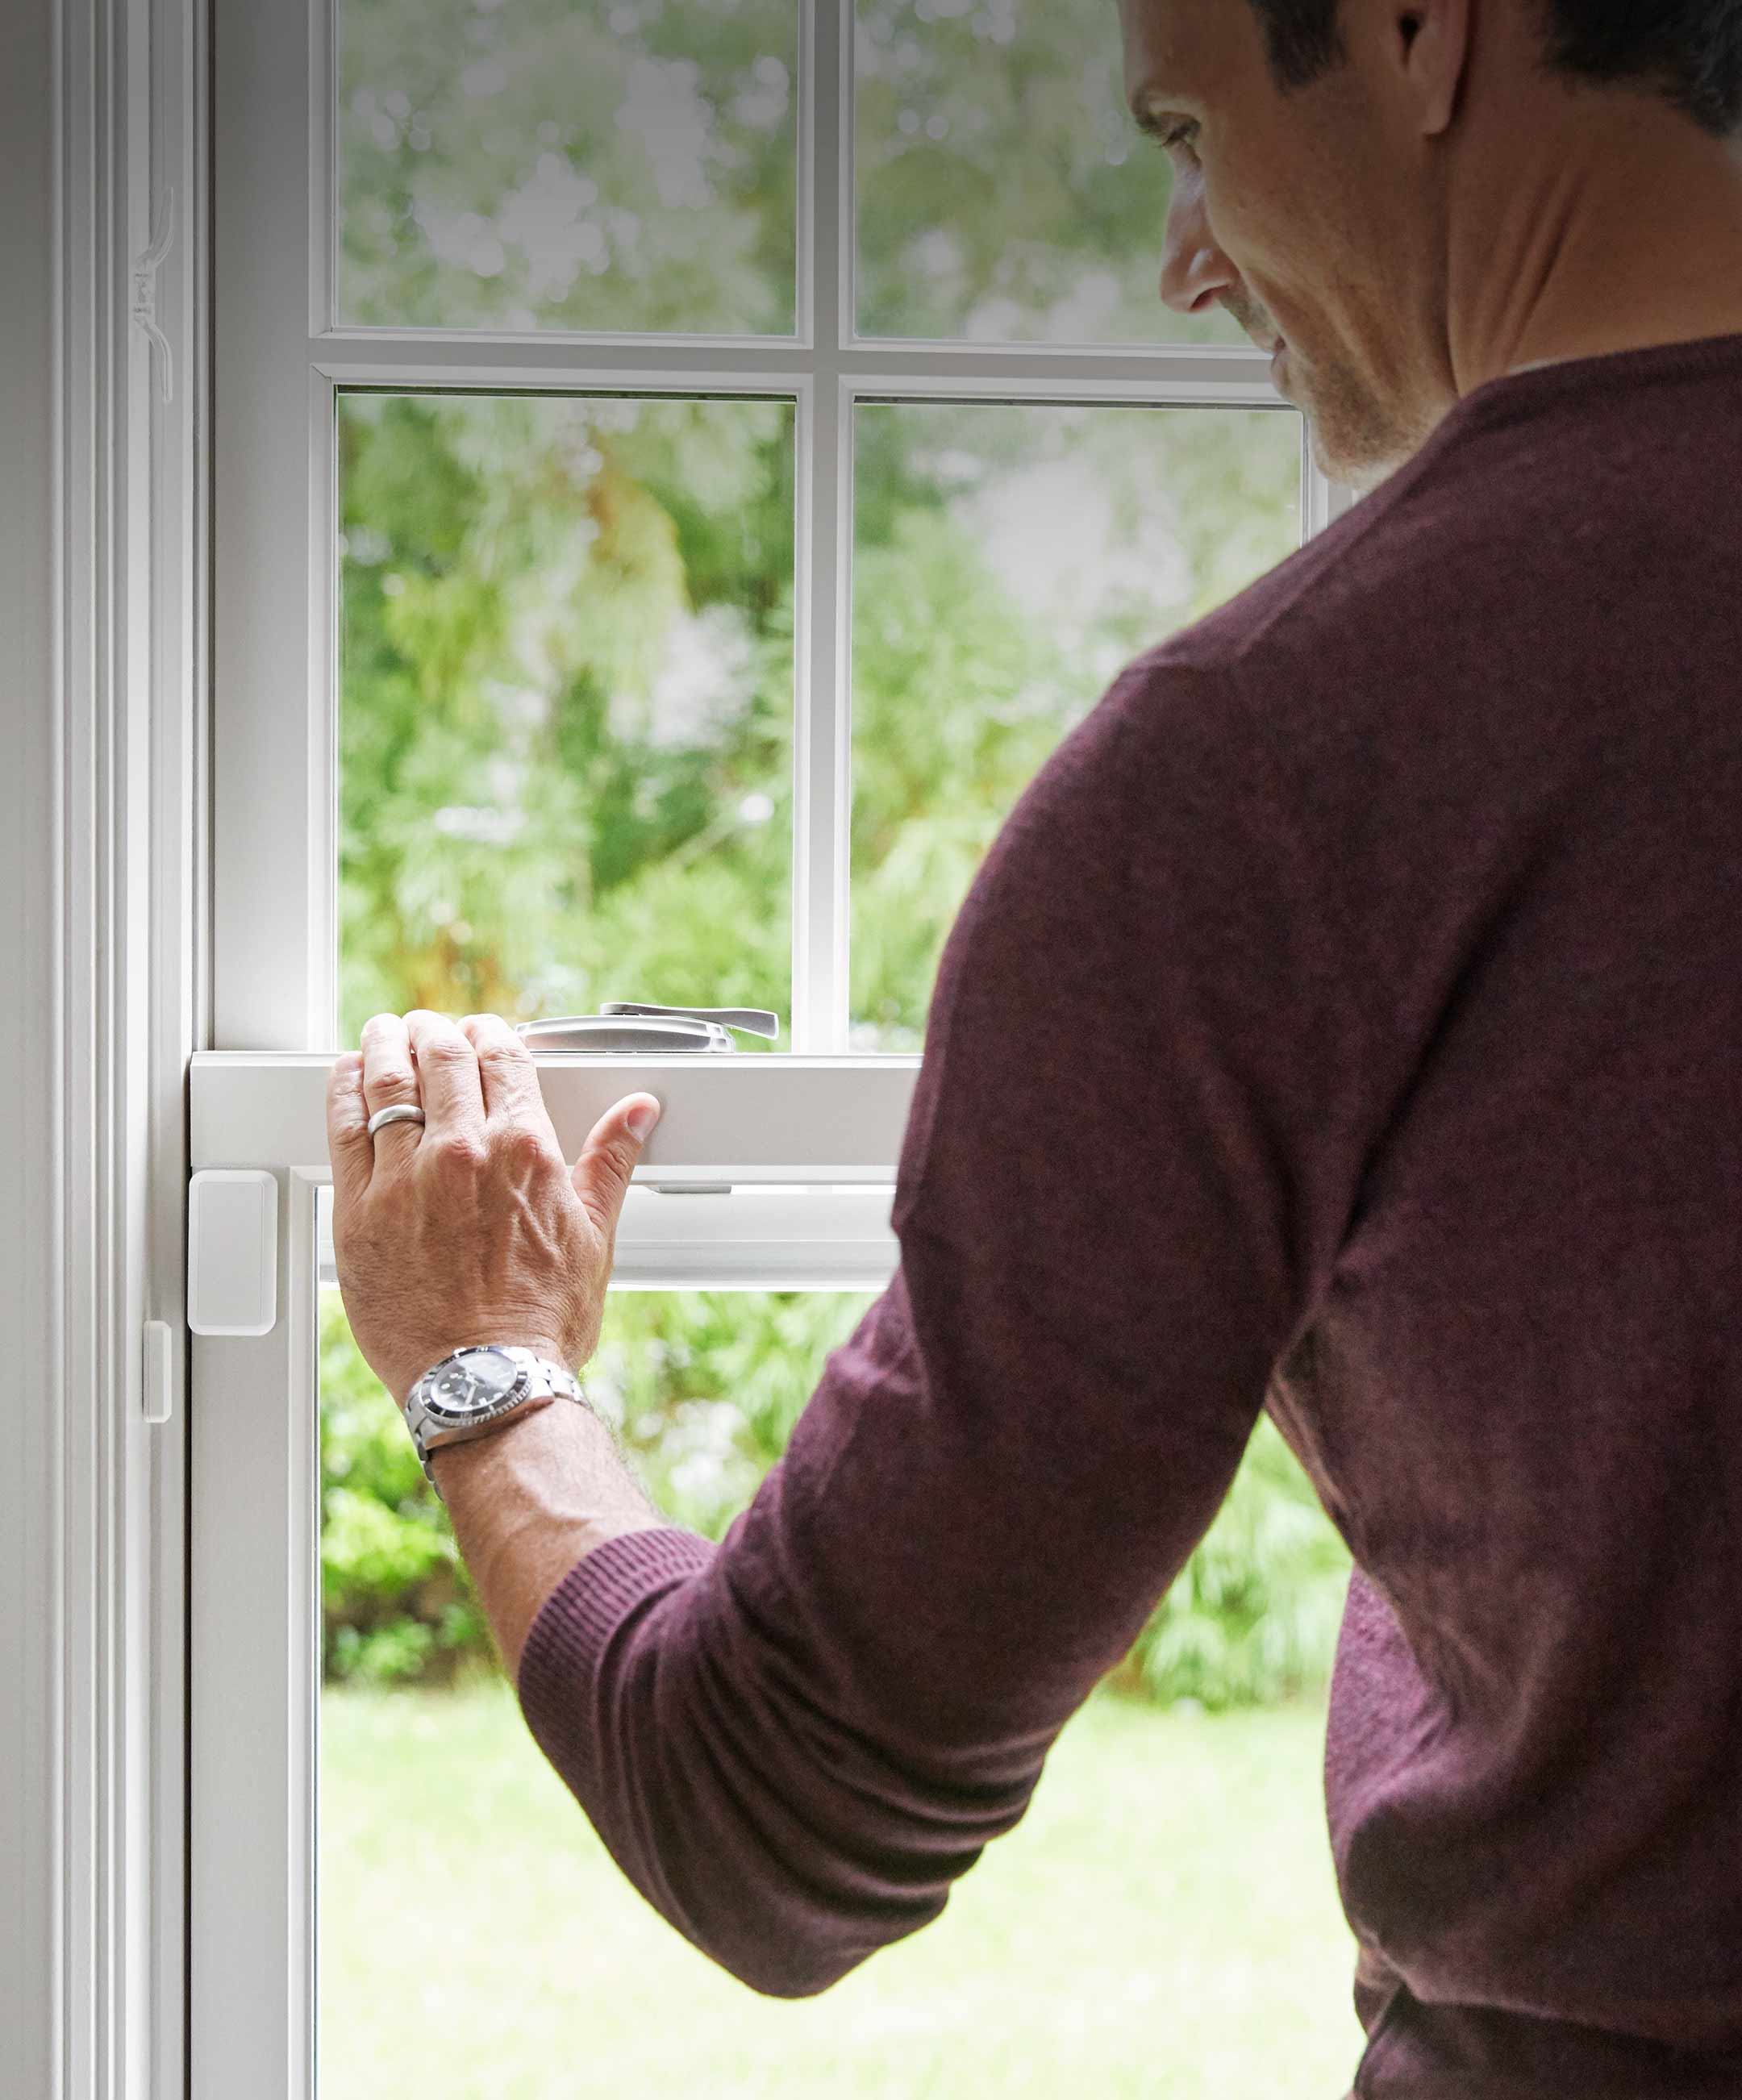 Smart home security sensors